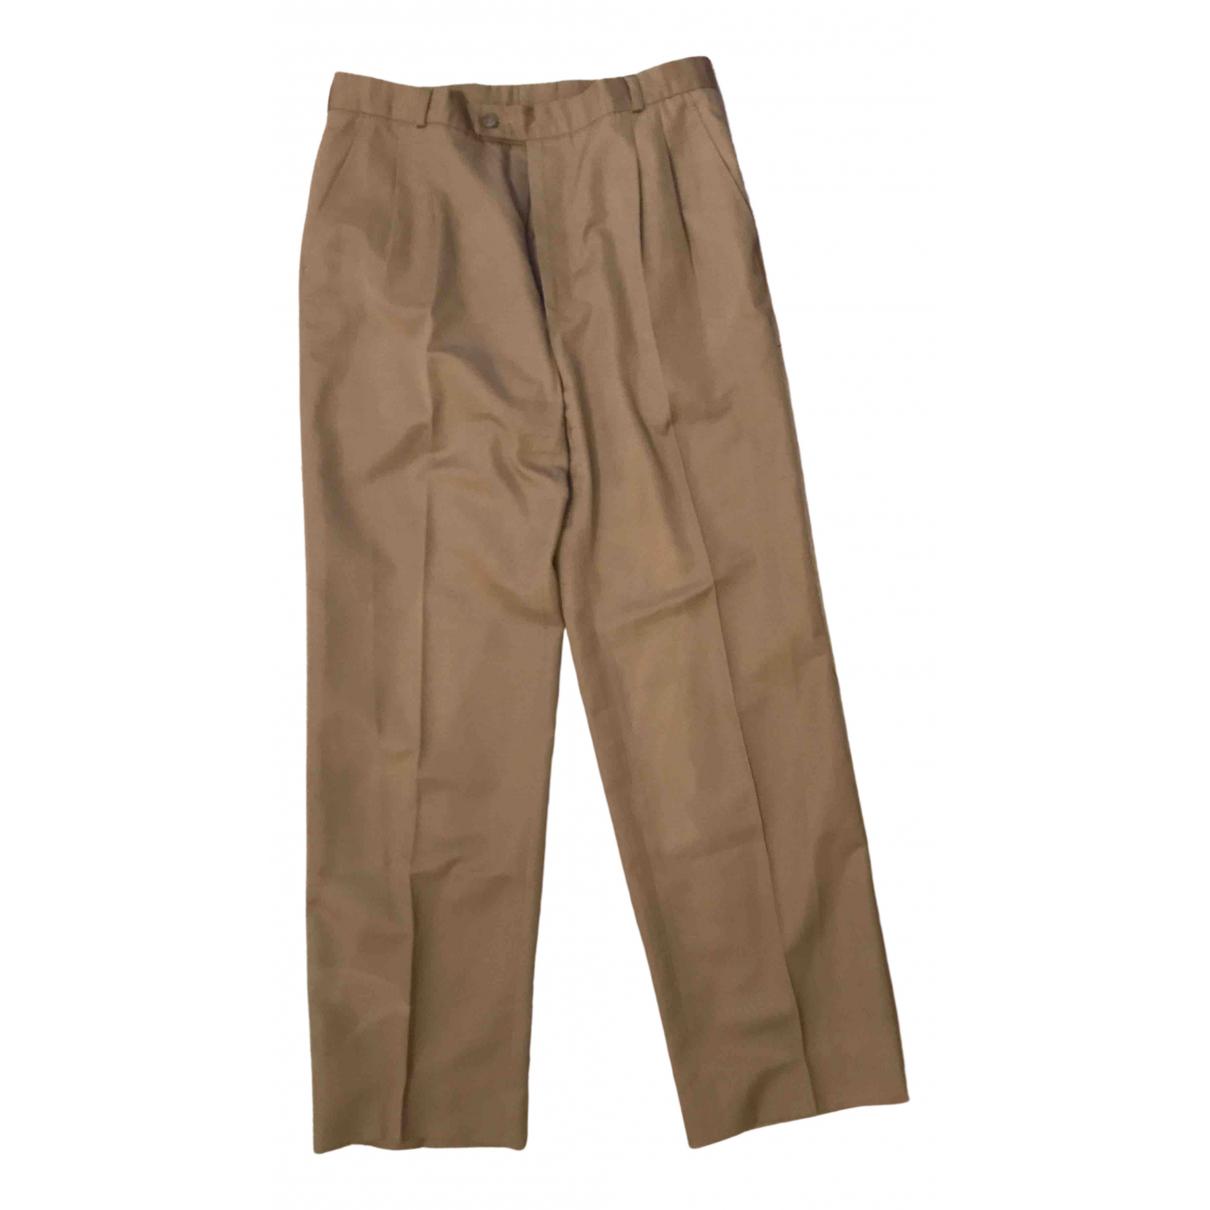 Yves Saint Laurent \N Beige Cotton Trousers for Men 42 FR